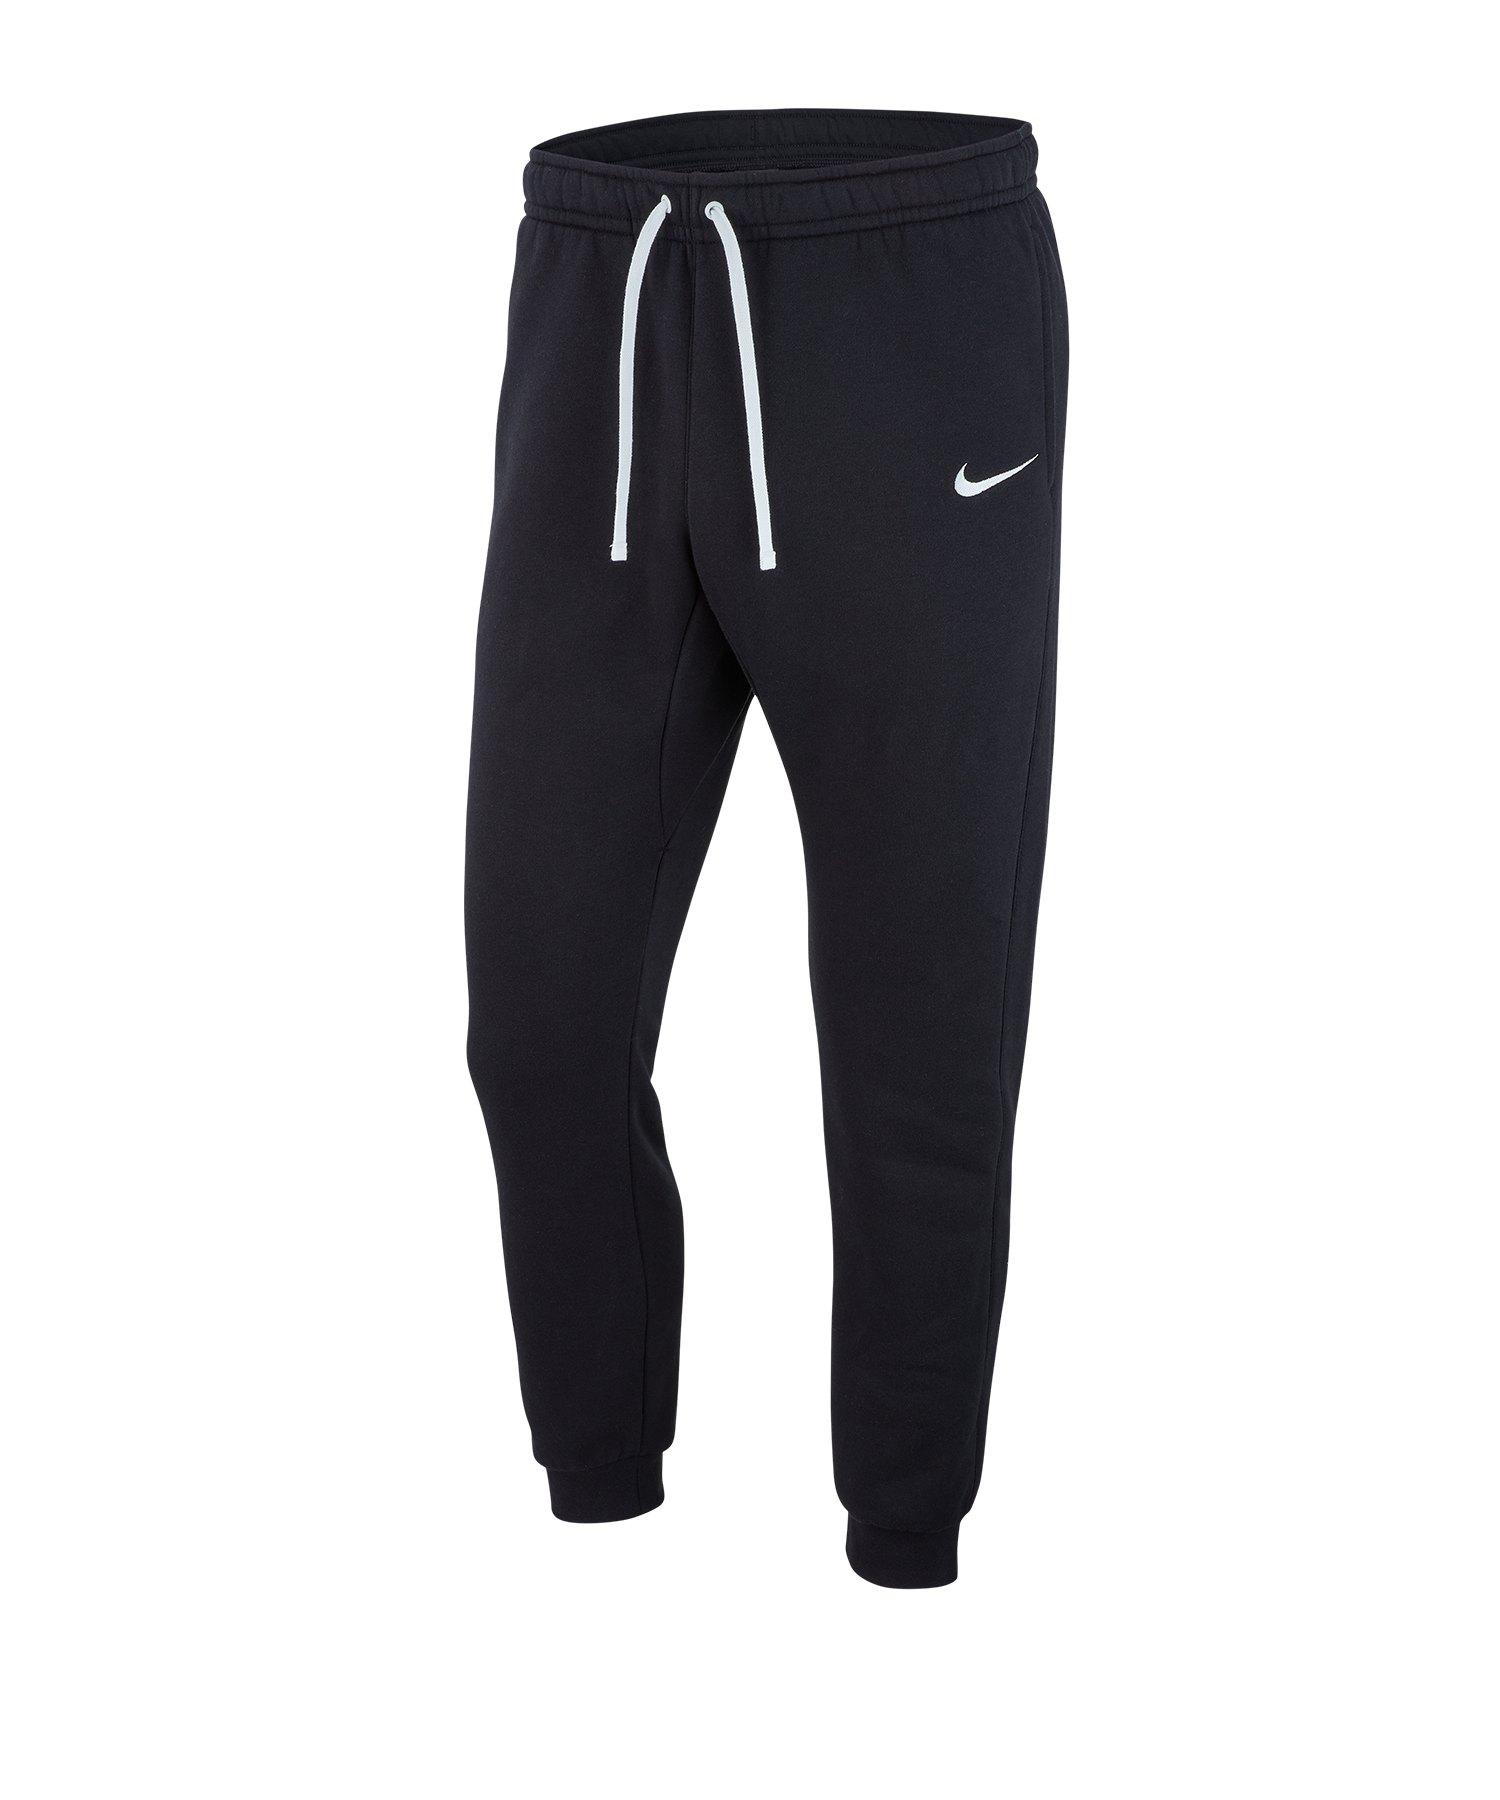 8de67820dab2ce Nike Team Club 19 Fleece Jogginghose Schwarz F010 - schwarz